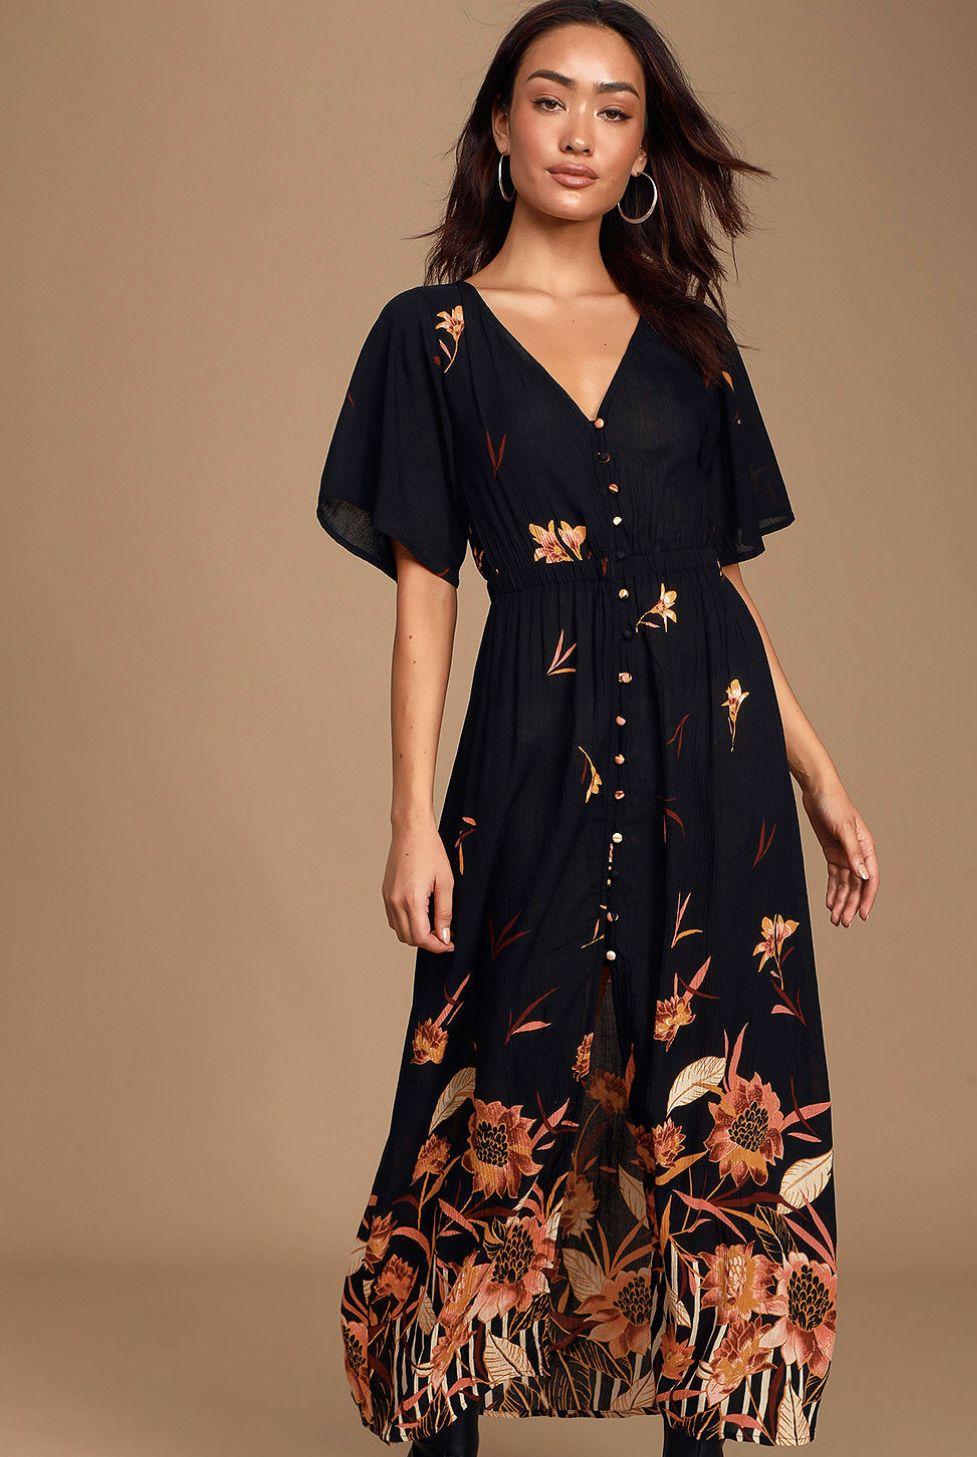 Autumn Breeze Black Floral Print Button Up Maxi Dress in